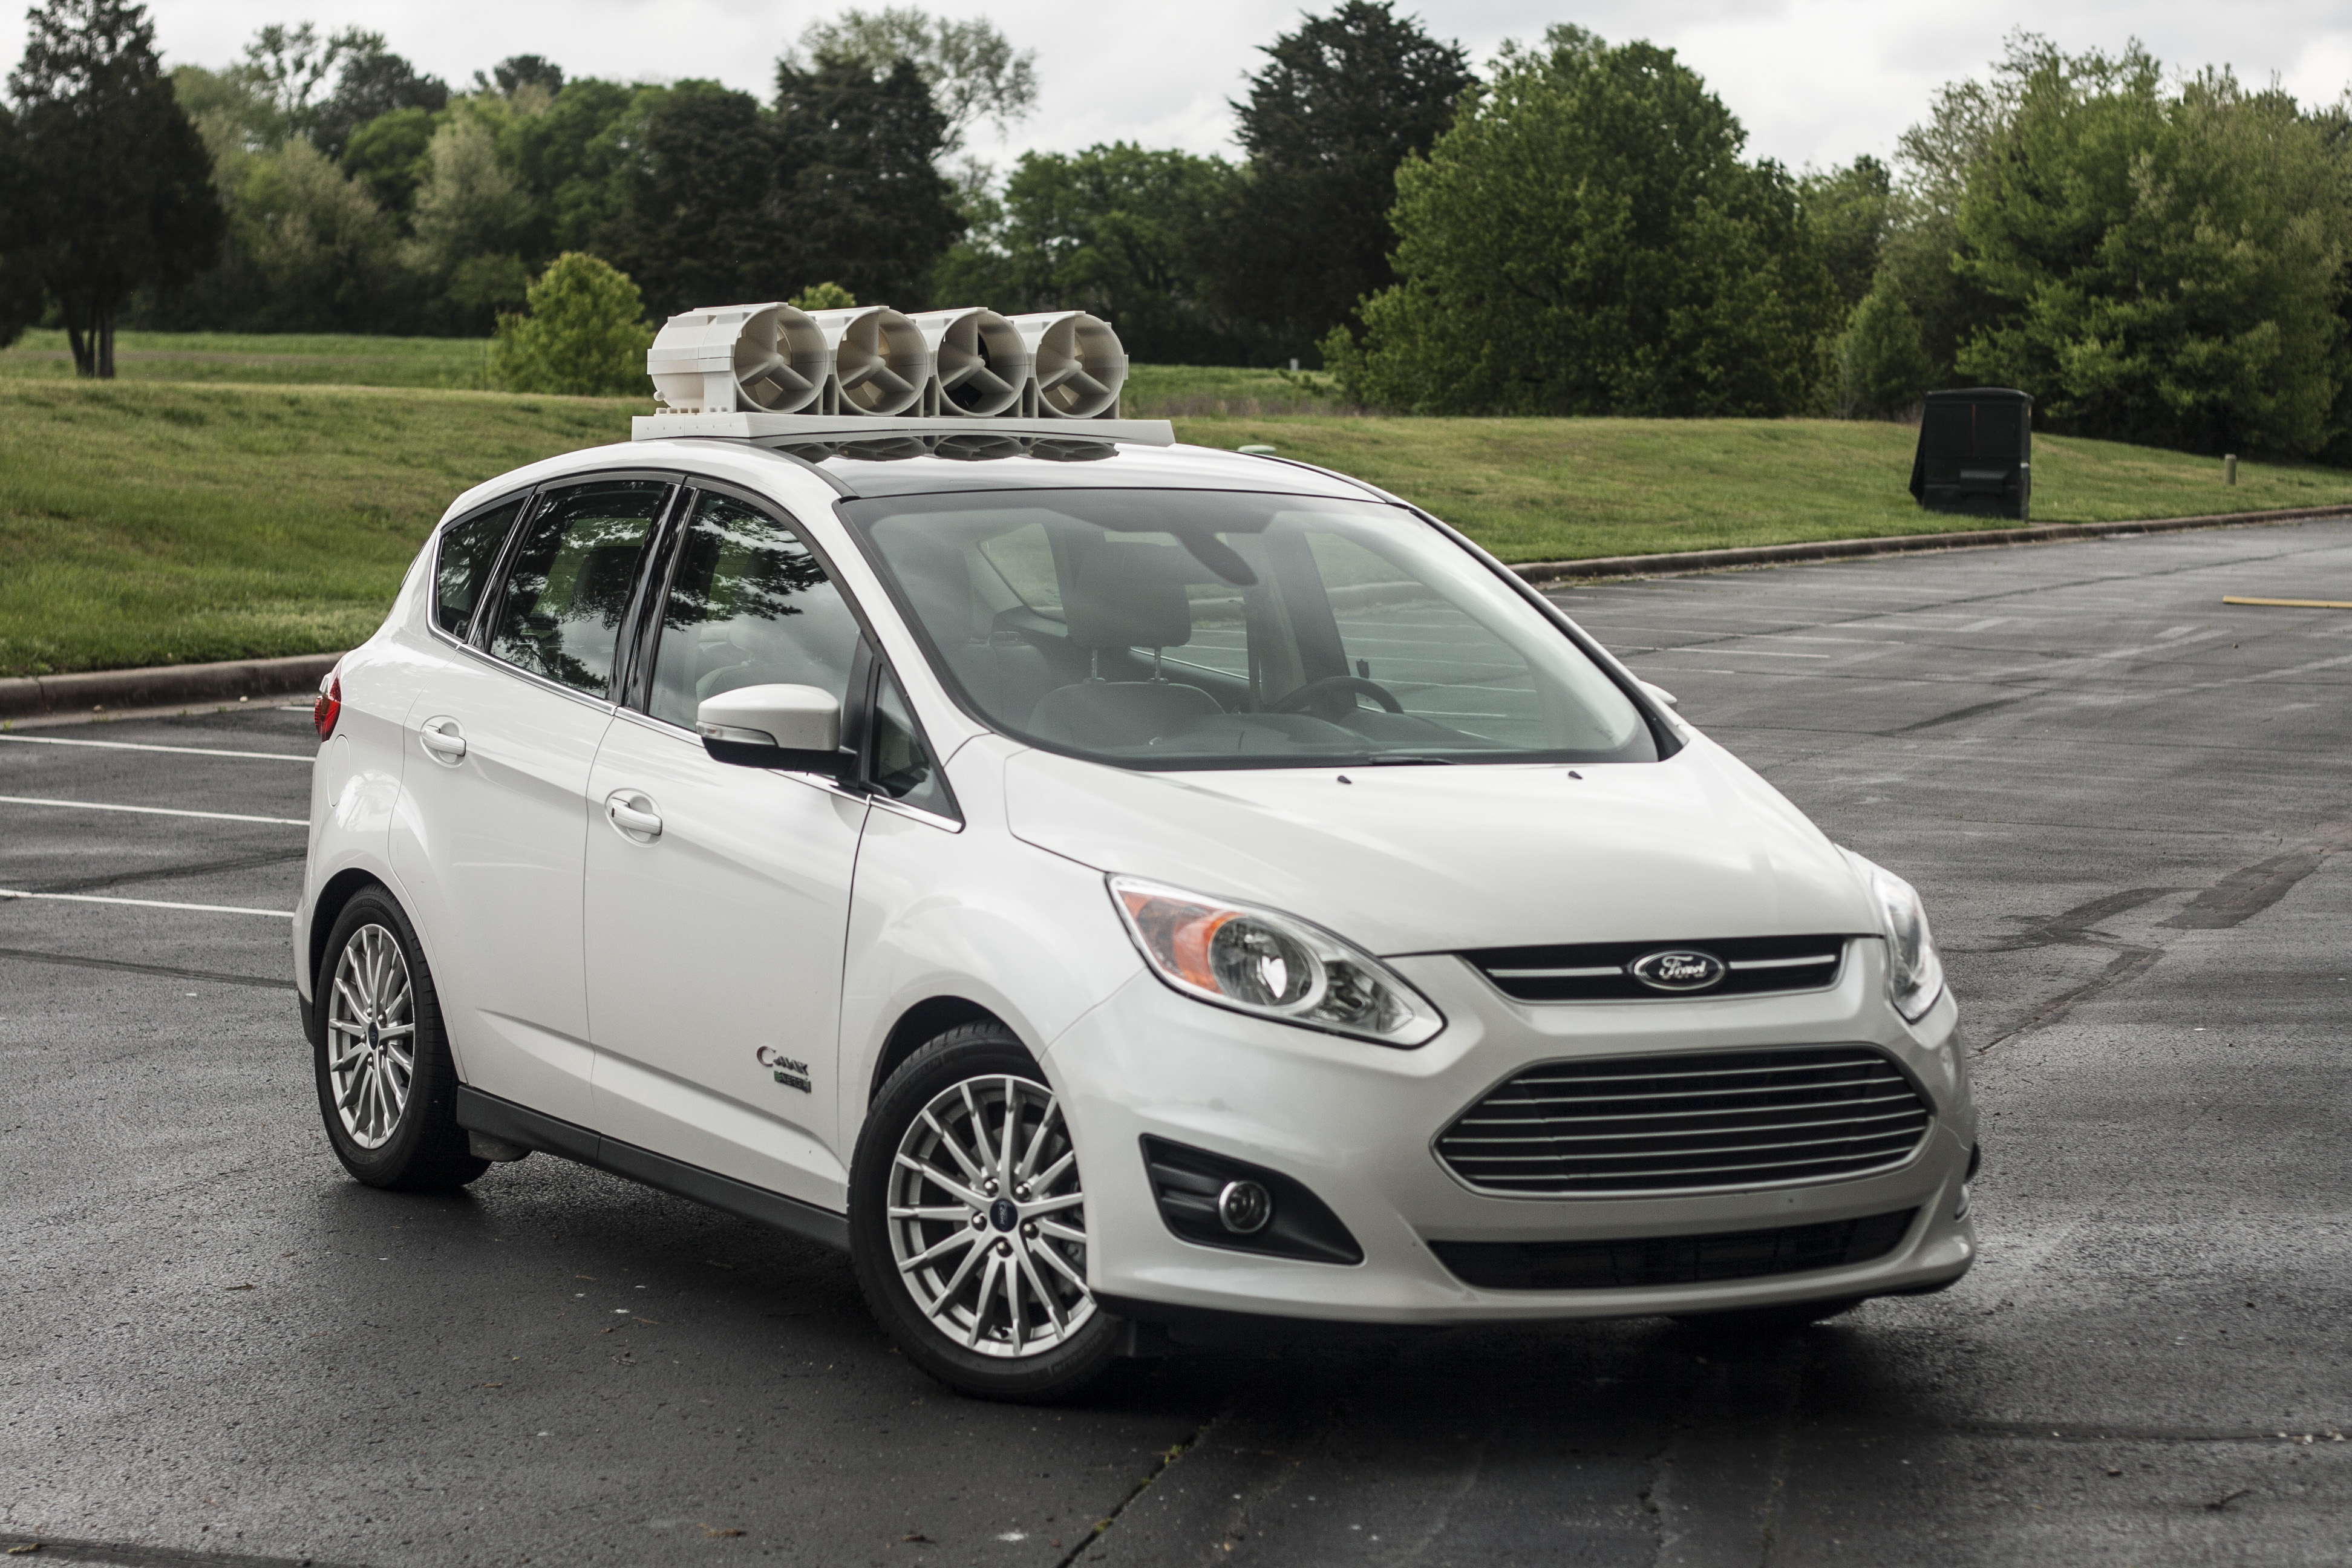 Ford Turbine Powered Car